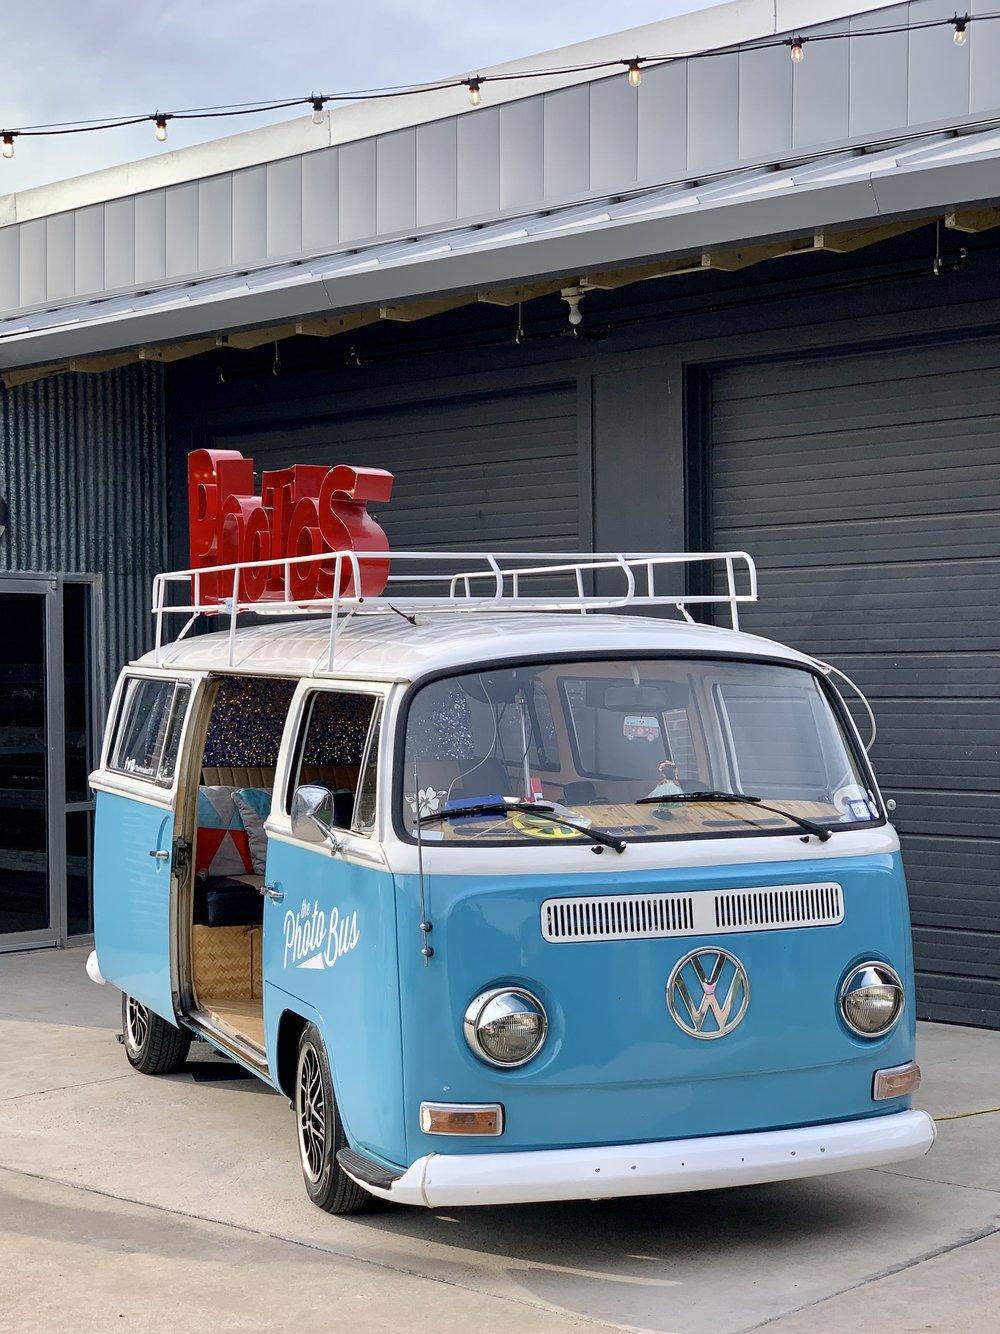 The Photo Bus DFW at MOPAC